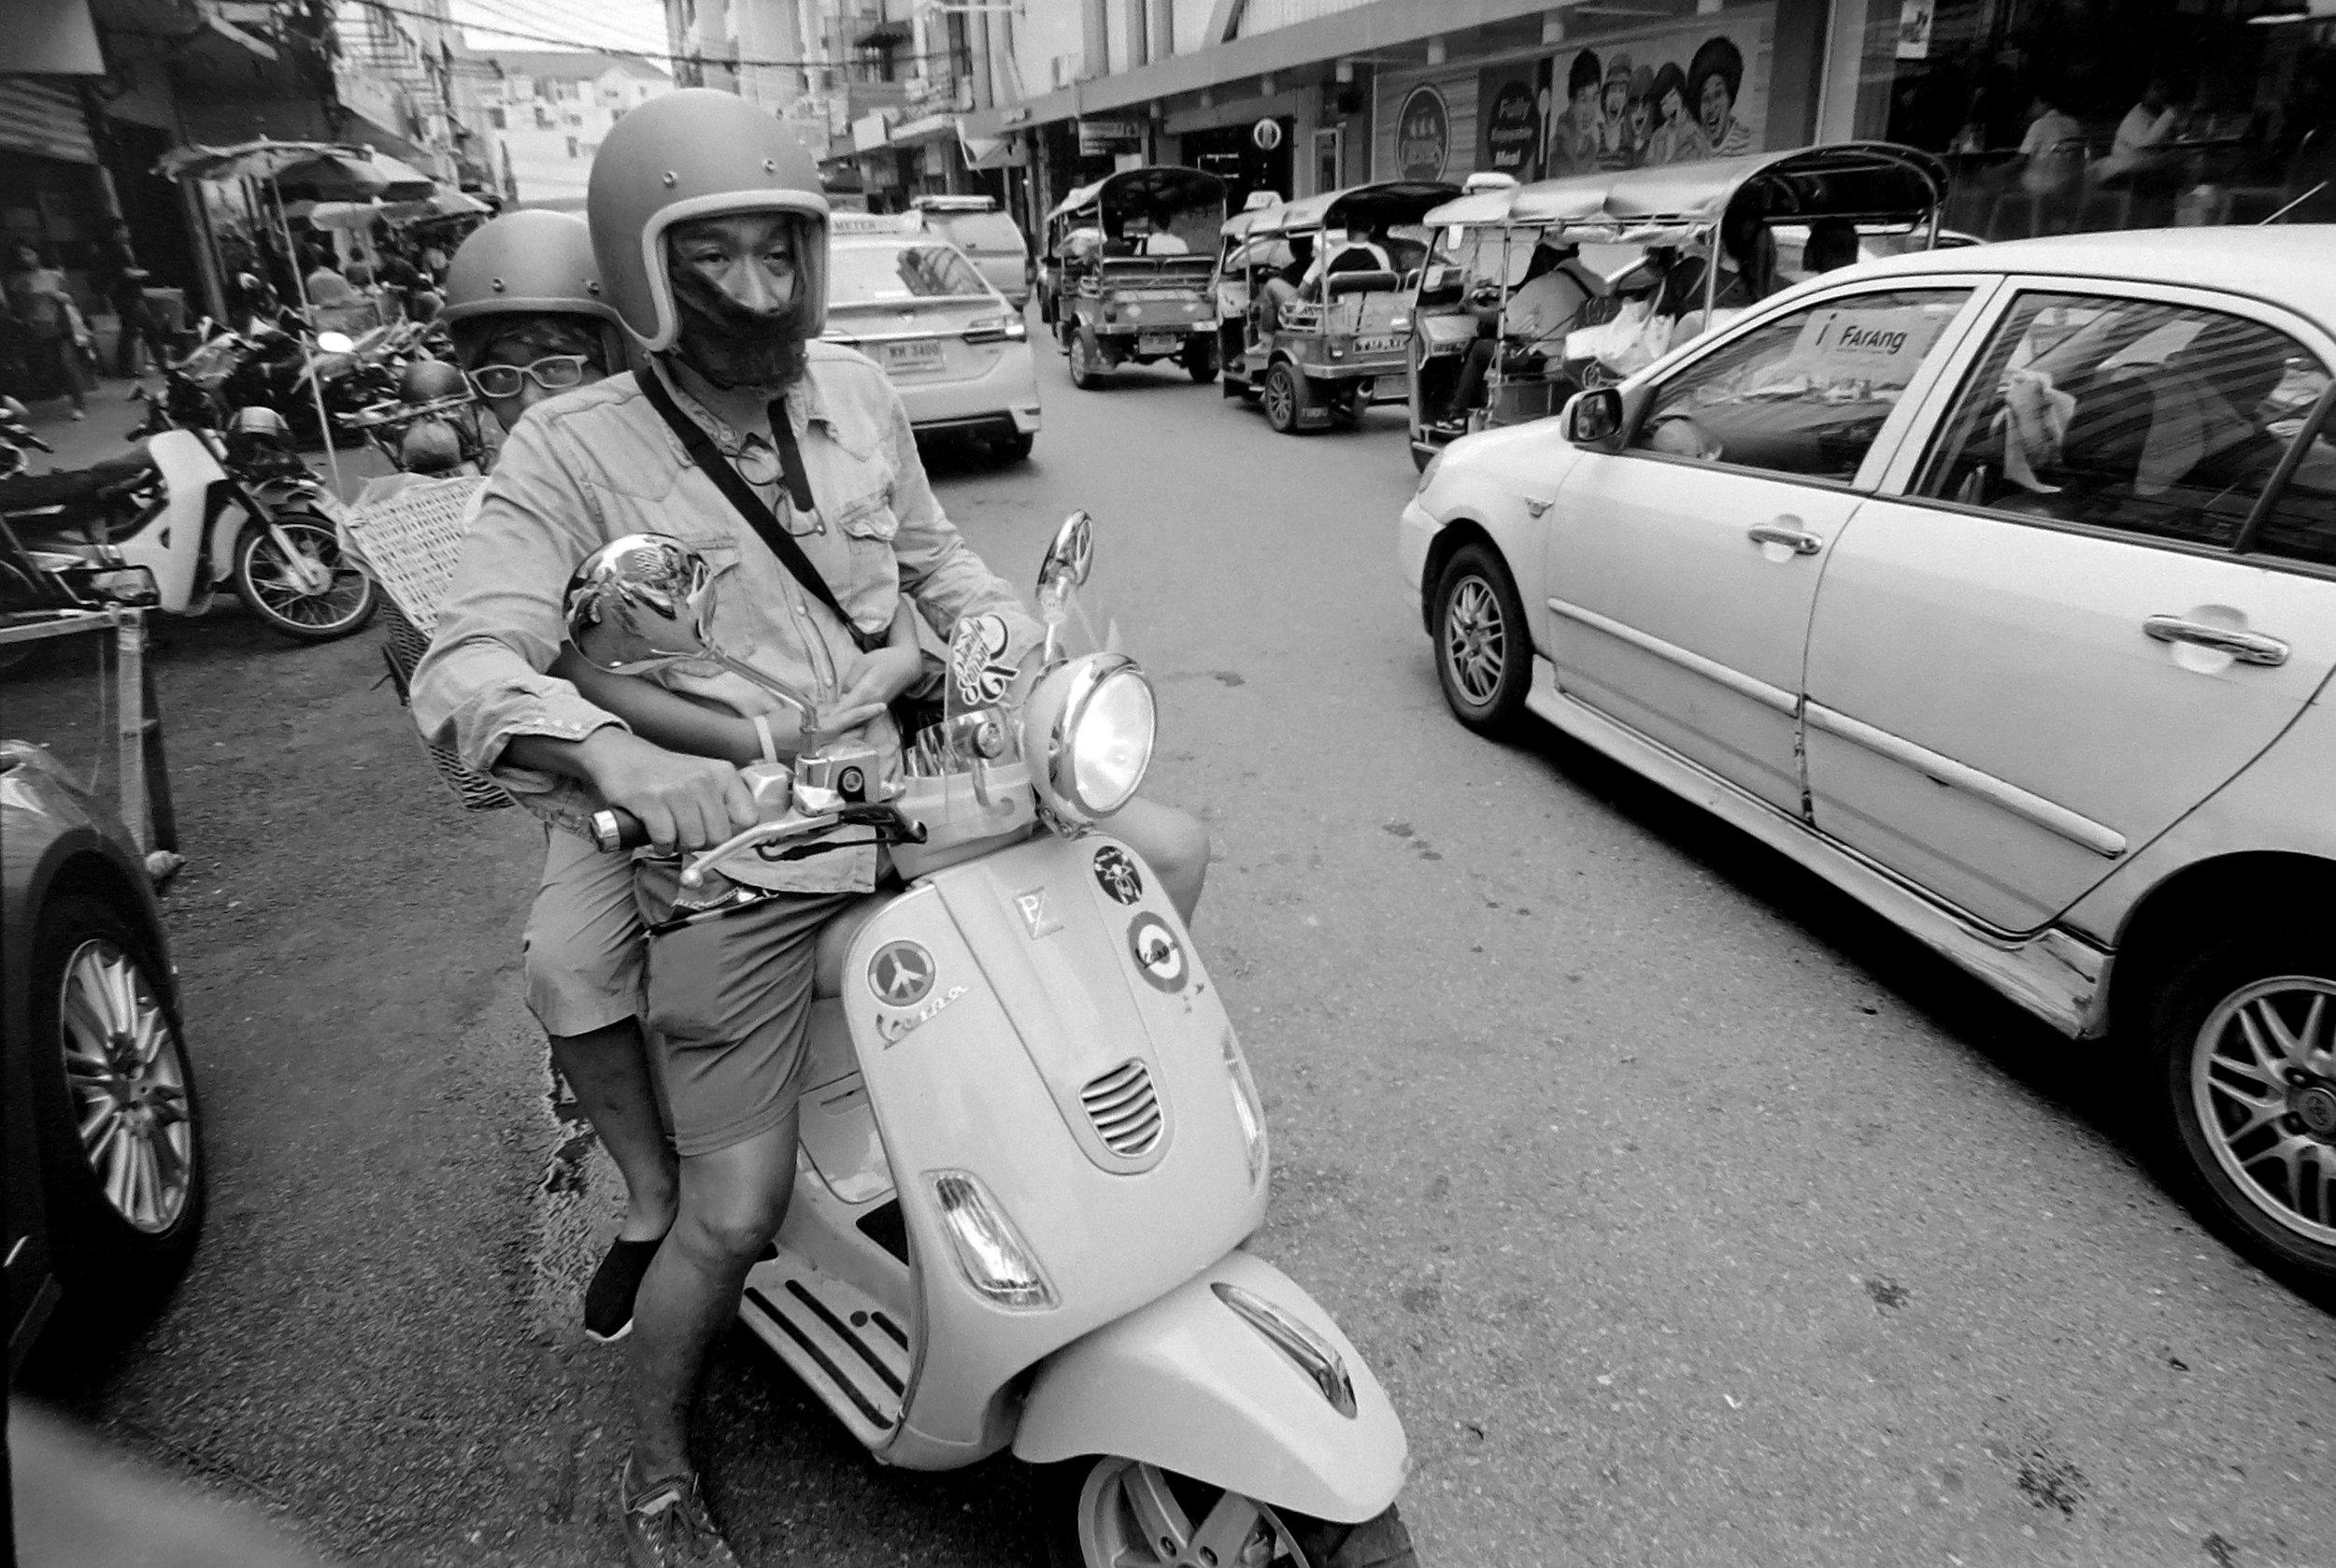 Chromacomaphoto Streetphotography Bangkok Thailand Leica 21mm super angulon sa 3 4 kodak tri x film (14).JPG